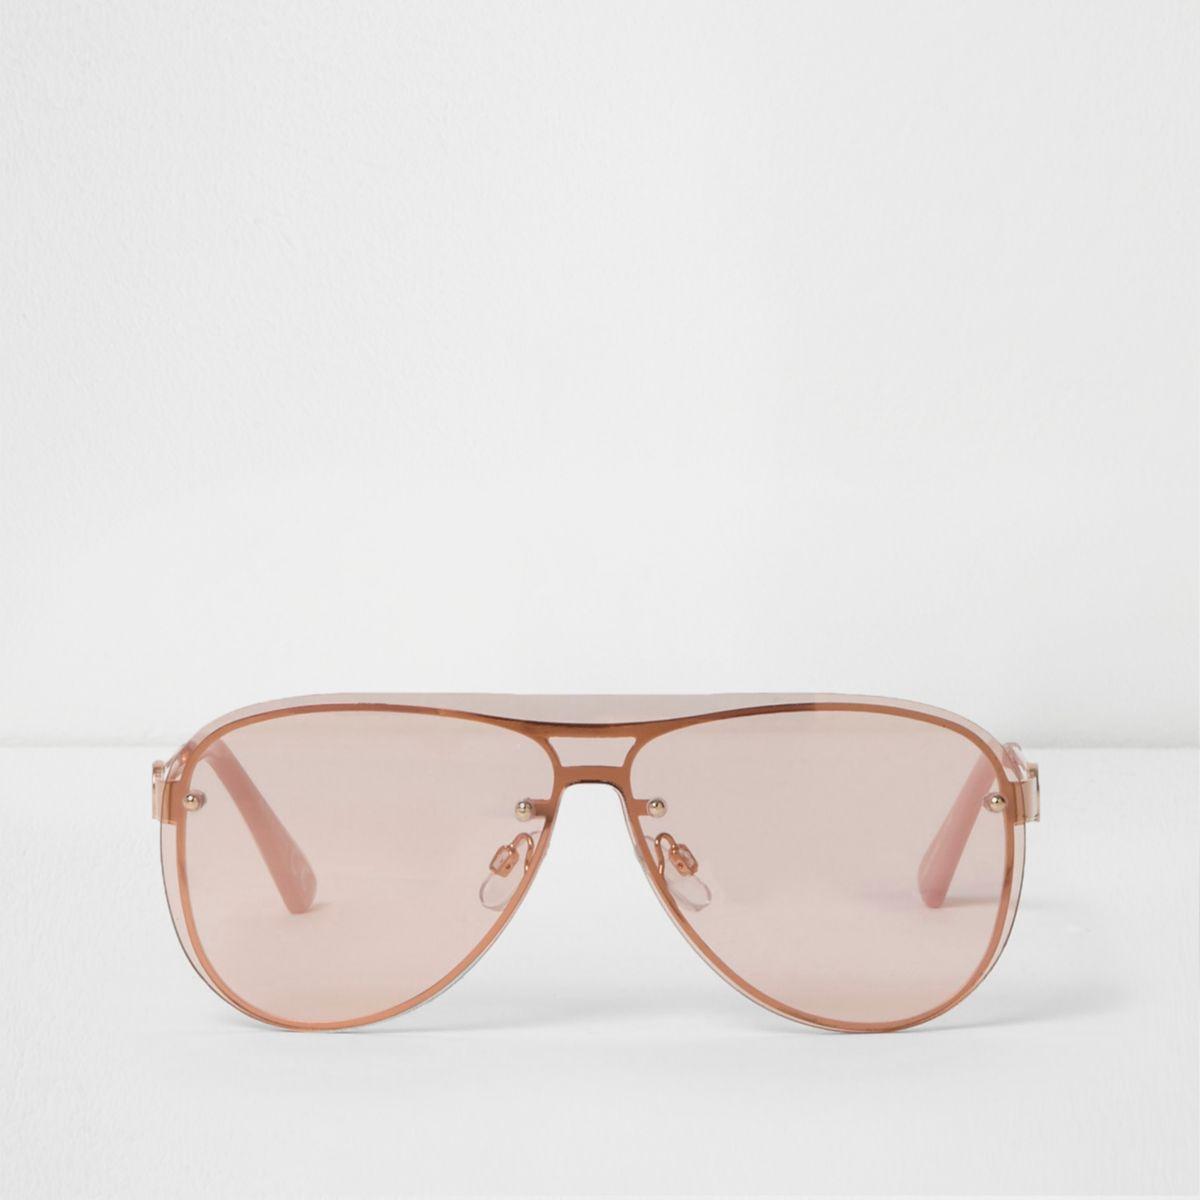 Rose gold tone visor aviator sunglasses